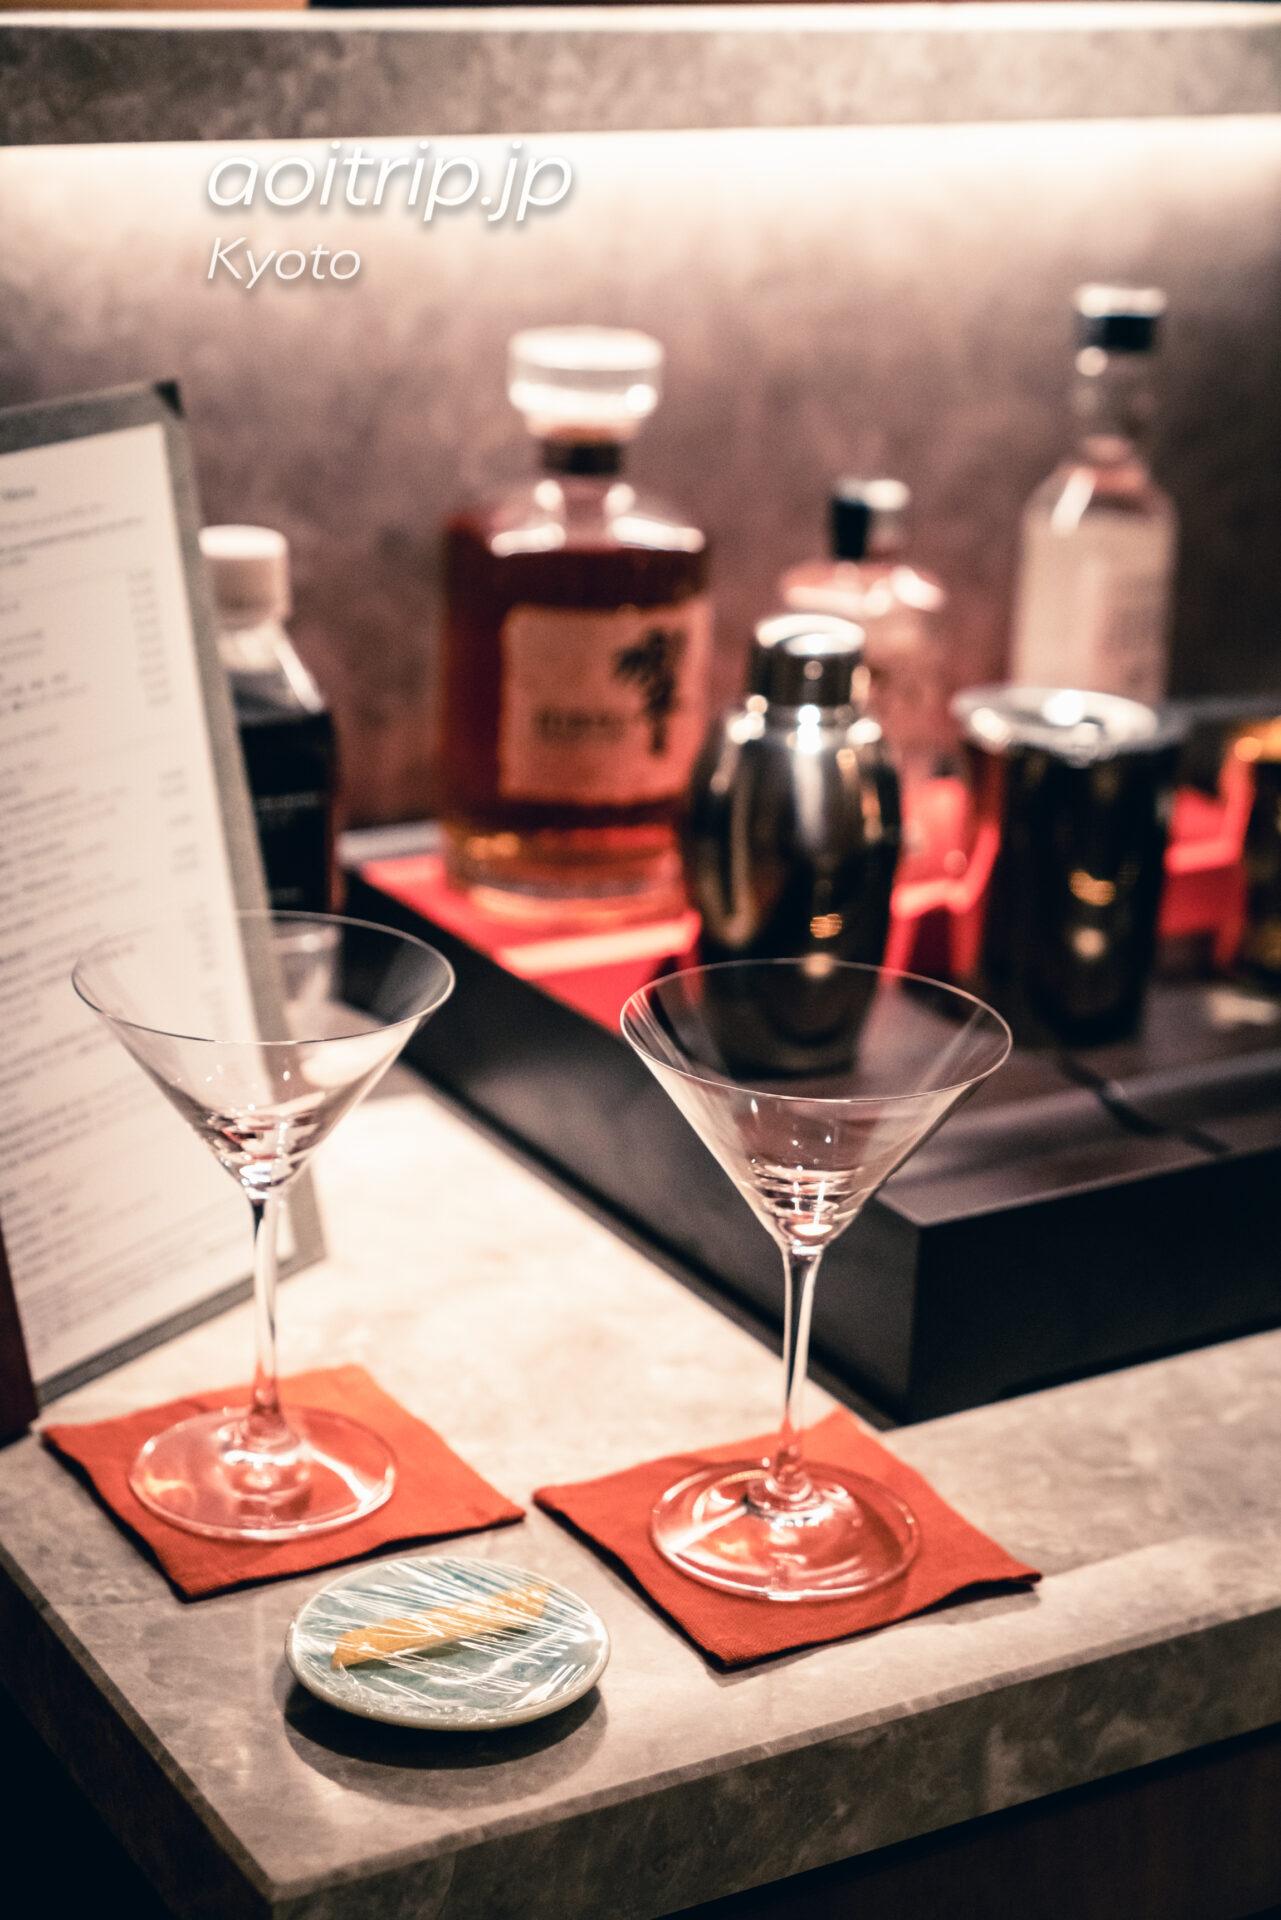 HOTEL THE MITSUI KYOTO ターンダウンサービス ミニバーのカクテルグラスとオレンジピール